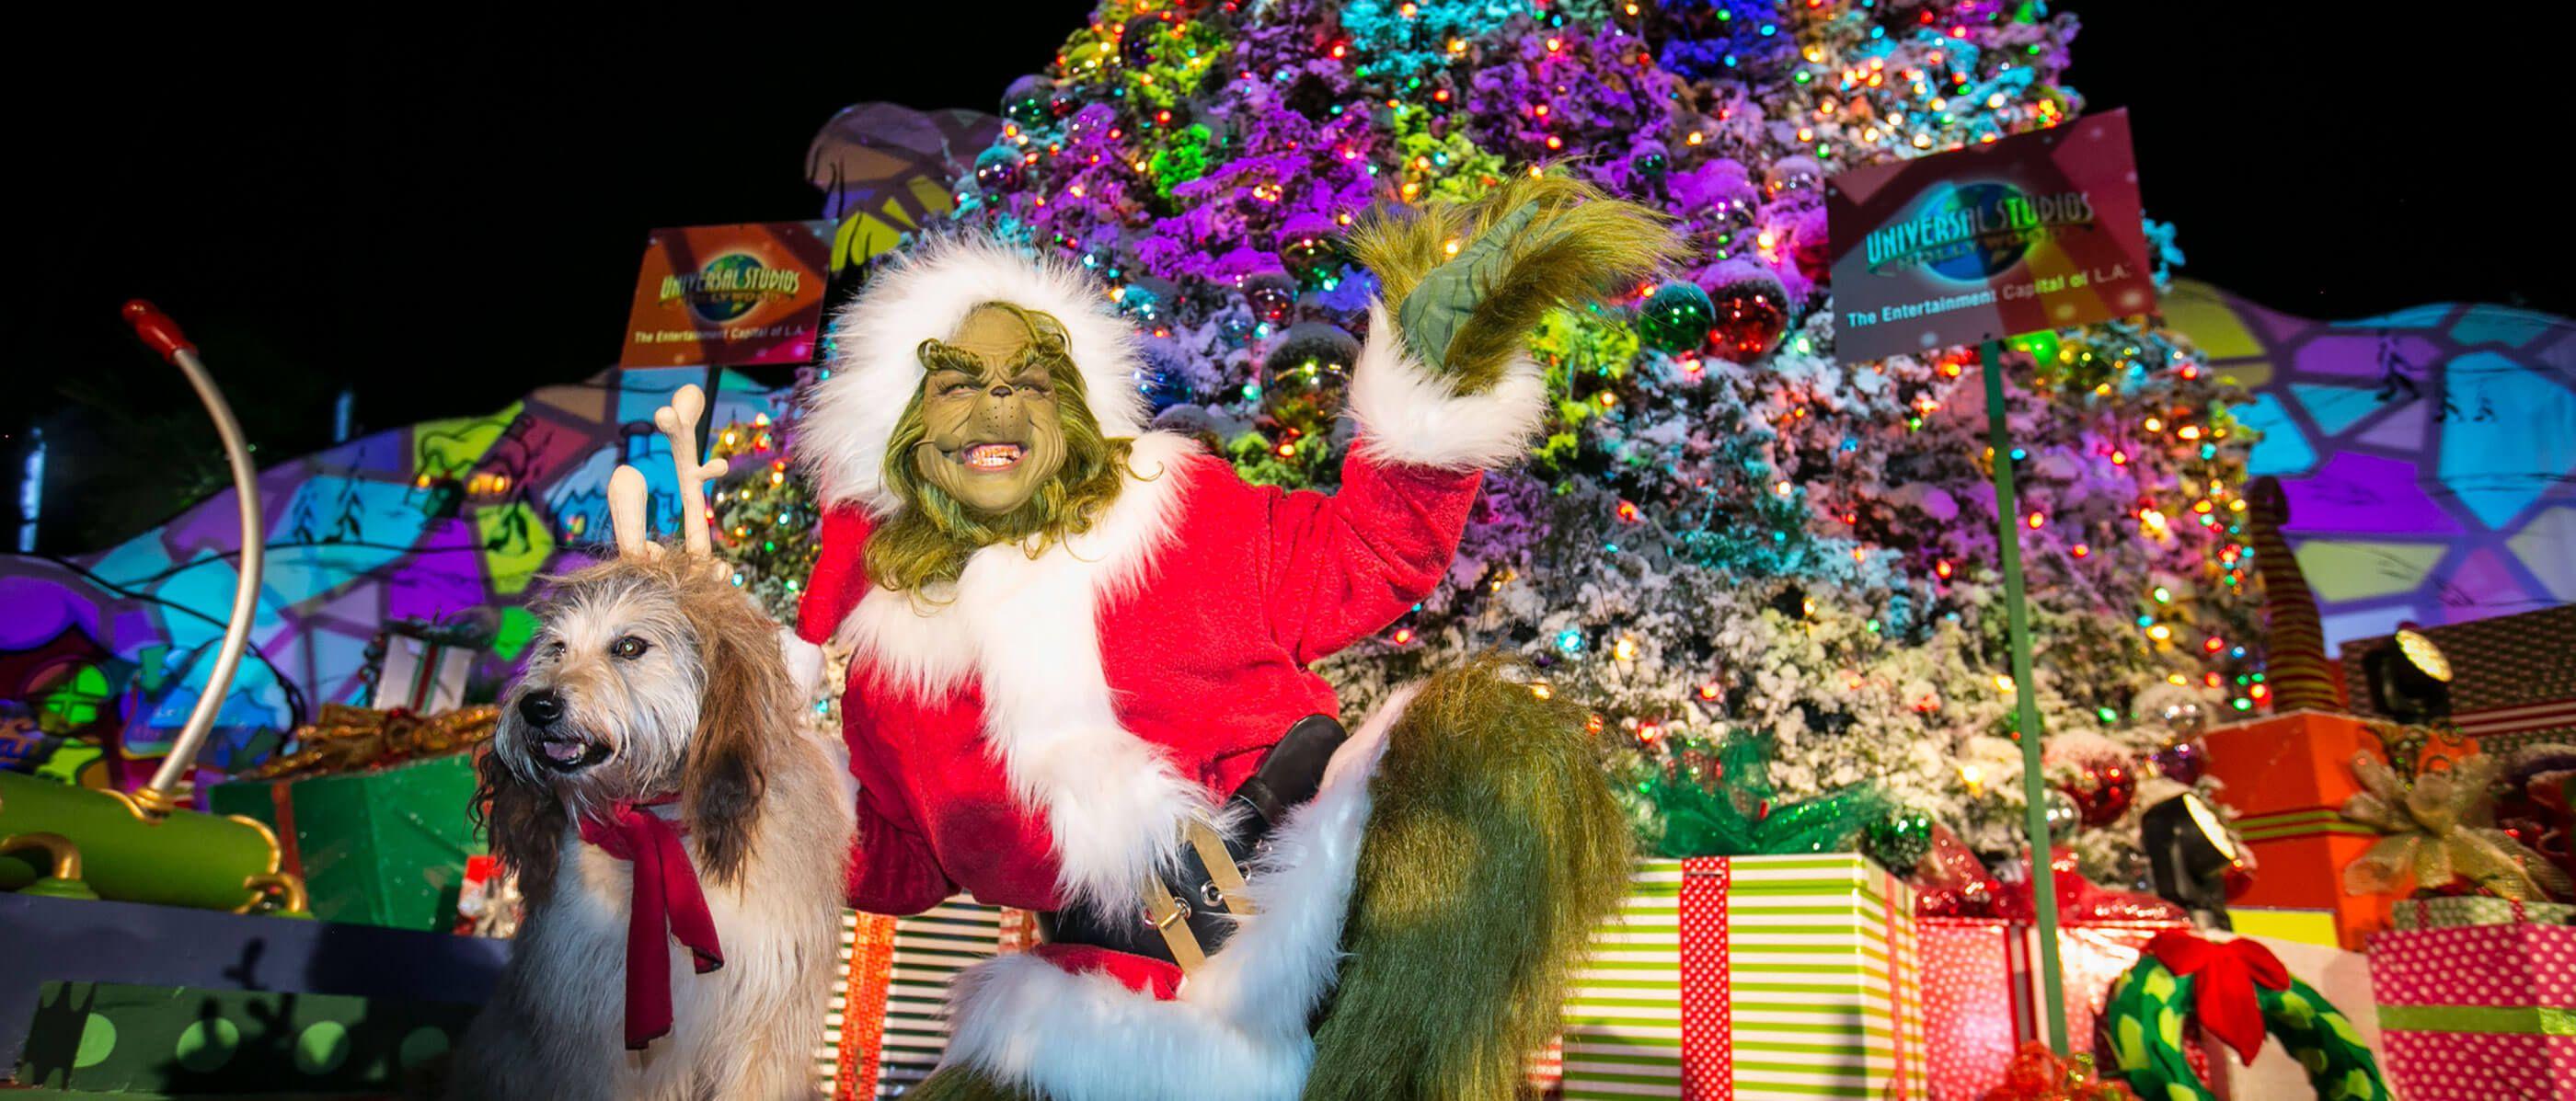 Hollywood Christmas 2020 Universal Studios Hollywood Christmas 2020 Gift | Vtkekn